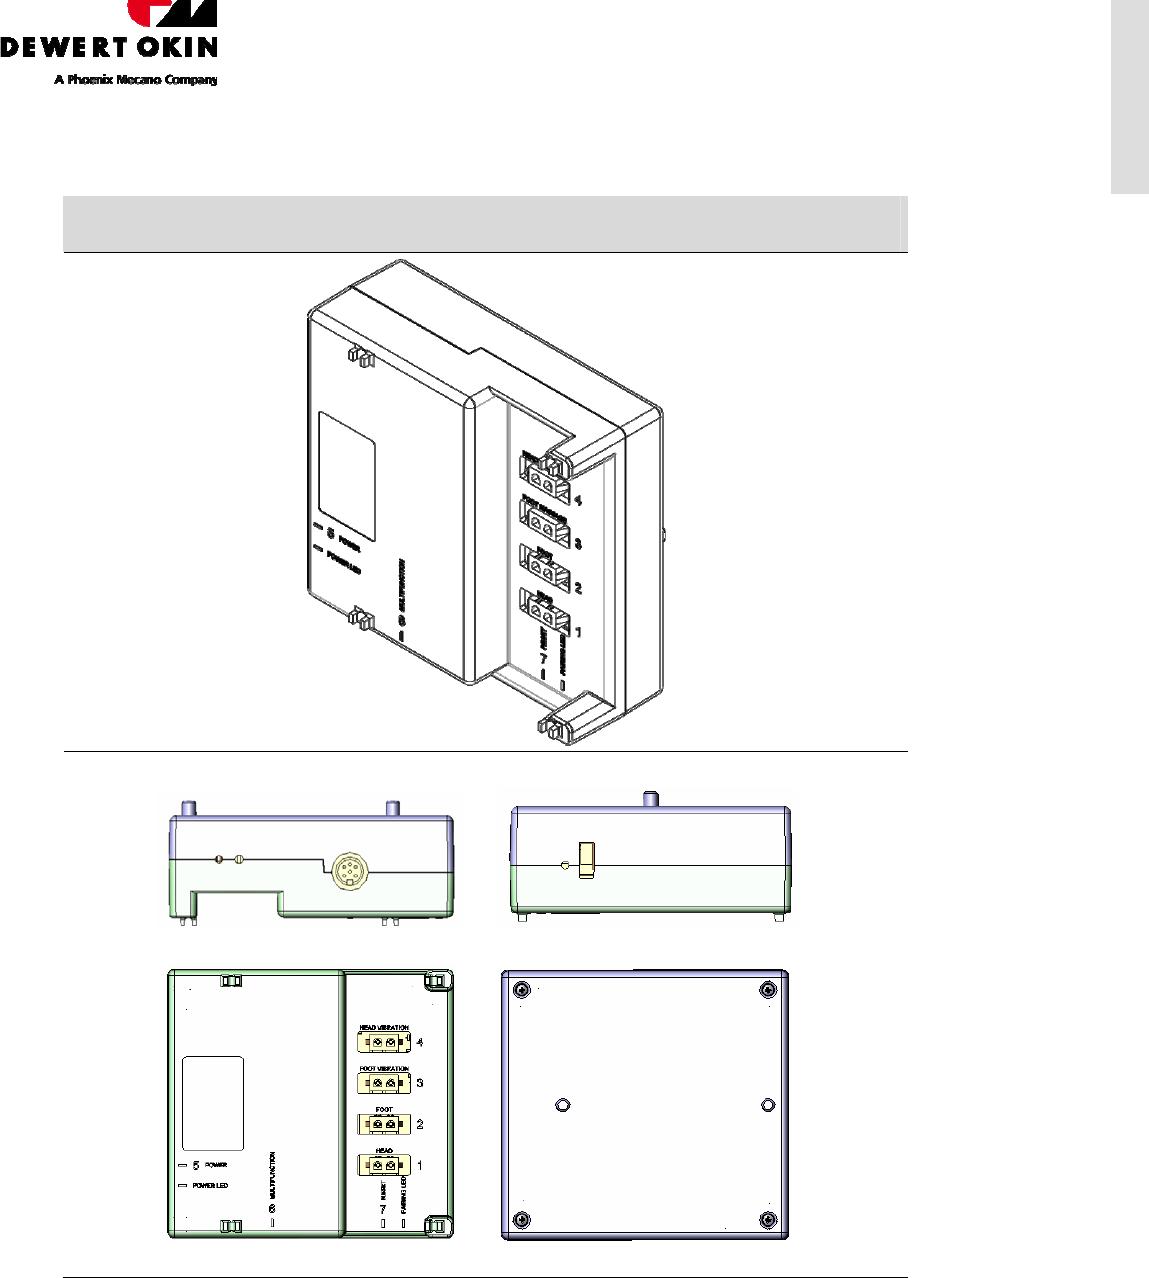 DewertOkin CU258-2 Control Unit 258-2 User Manual 300